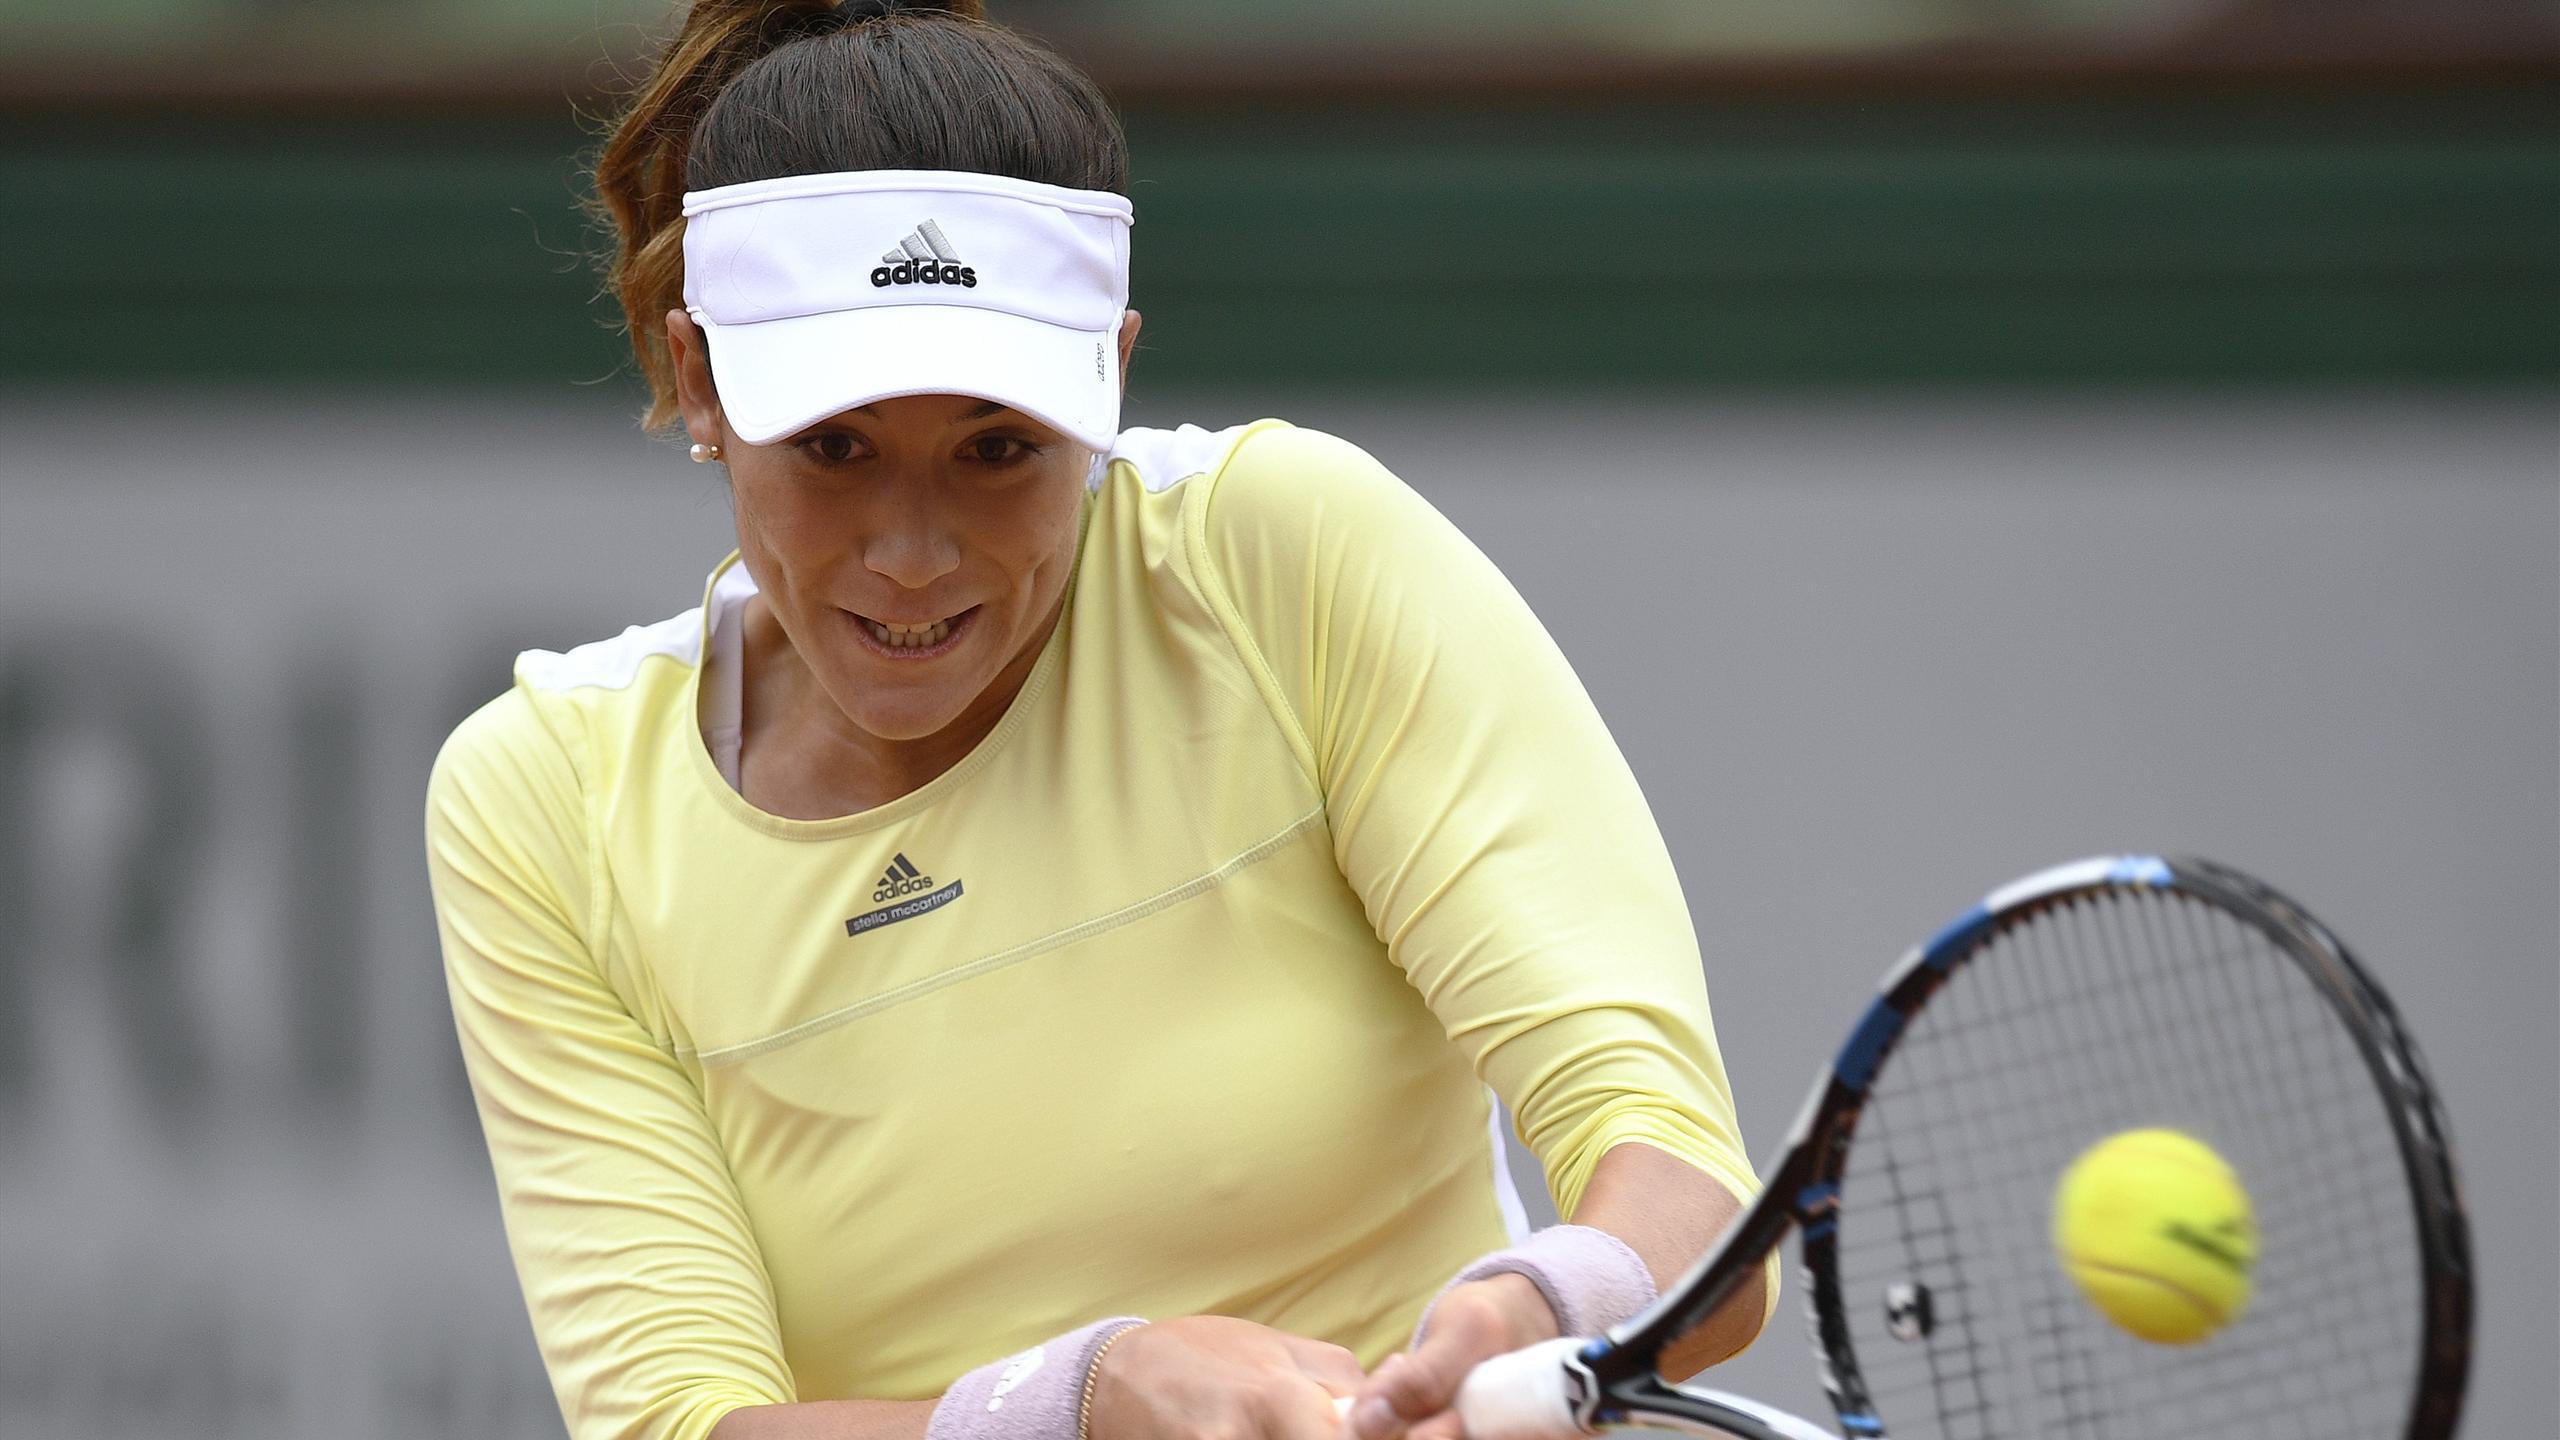 Spain's Garbine Muguruza returns the ball to Russia's Svetlana Kuznetsova